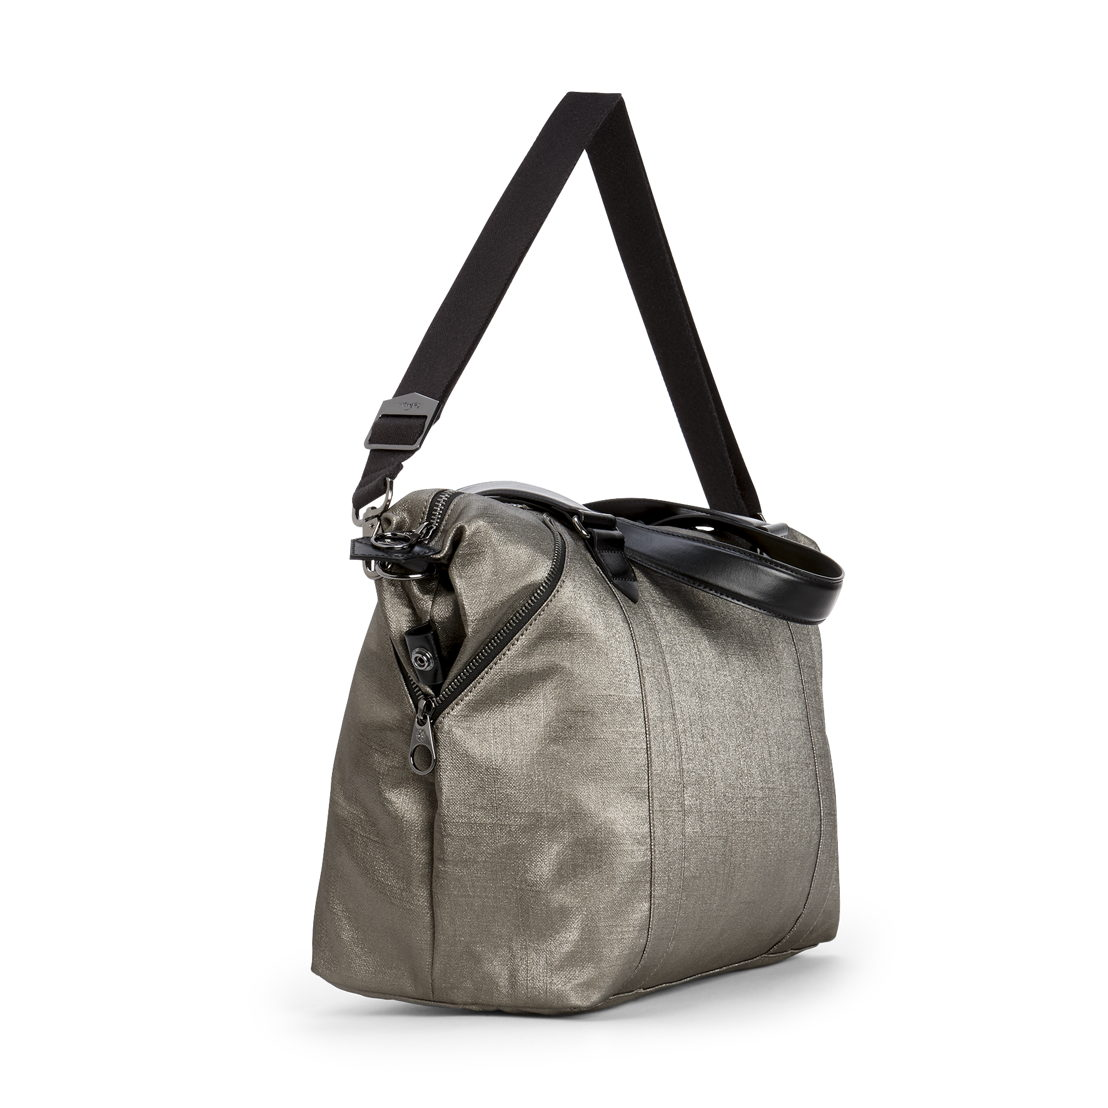 ART ORGANISED Coated Taupe – Shopper Tote mit herausnehmbaren Taschen  - 219.99€